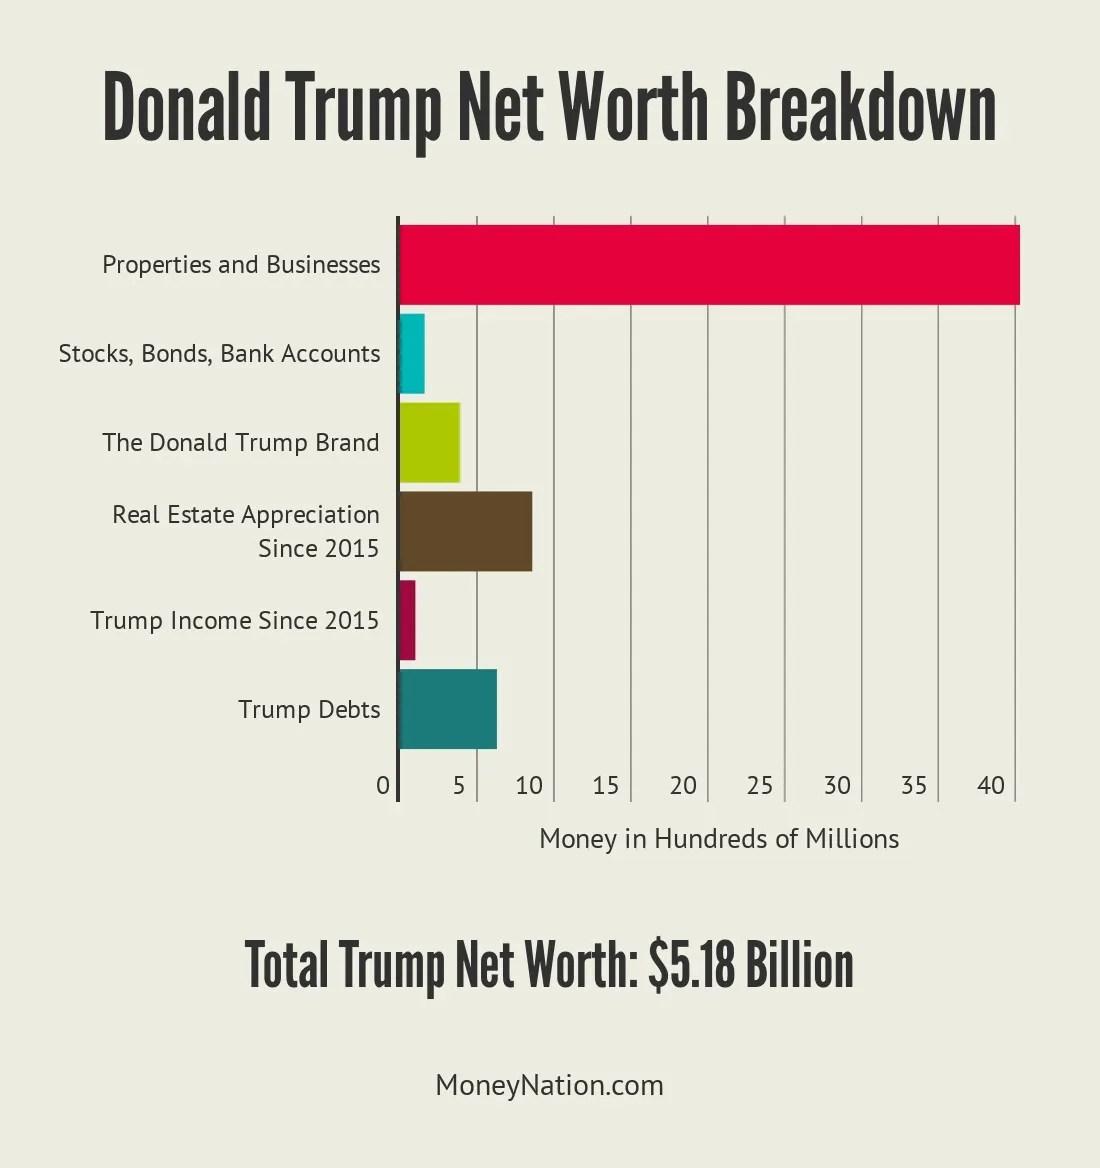 Donald Trump Net Worth Breakdown